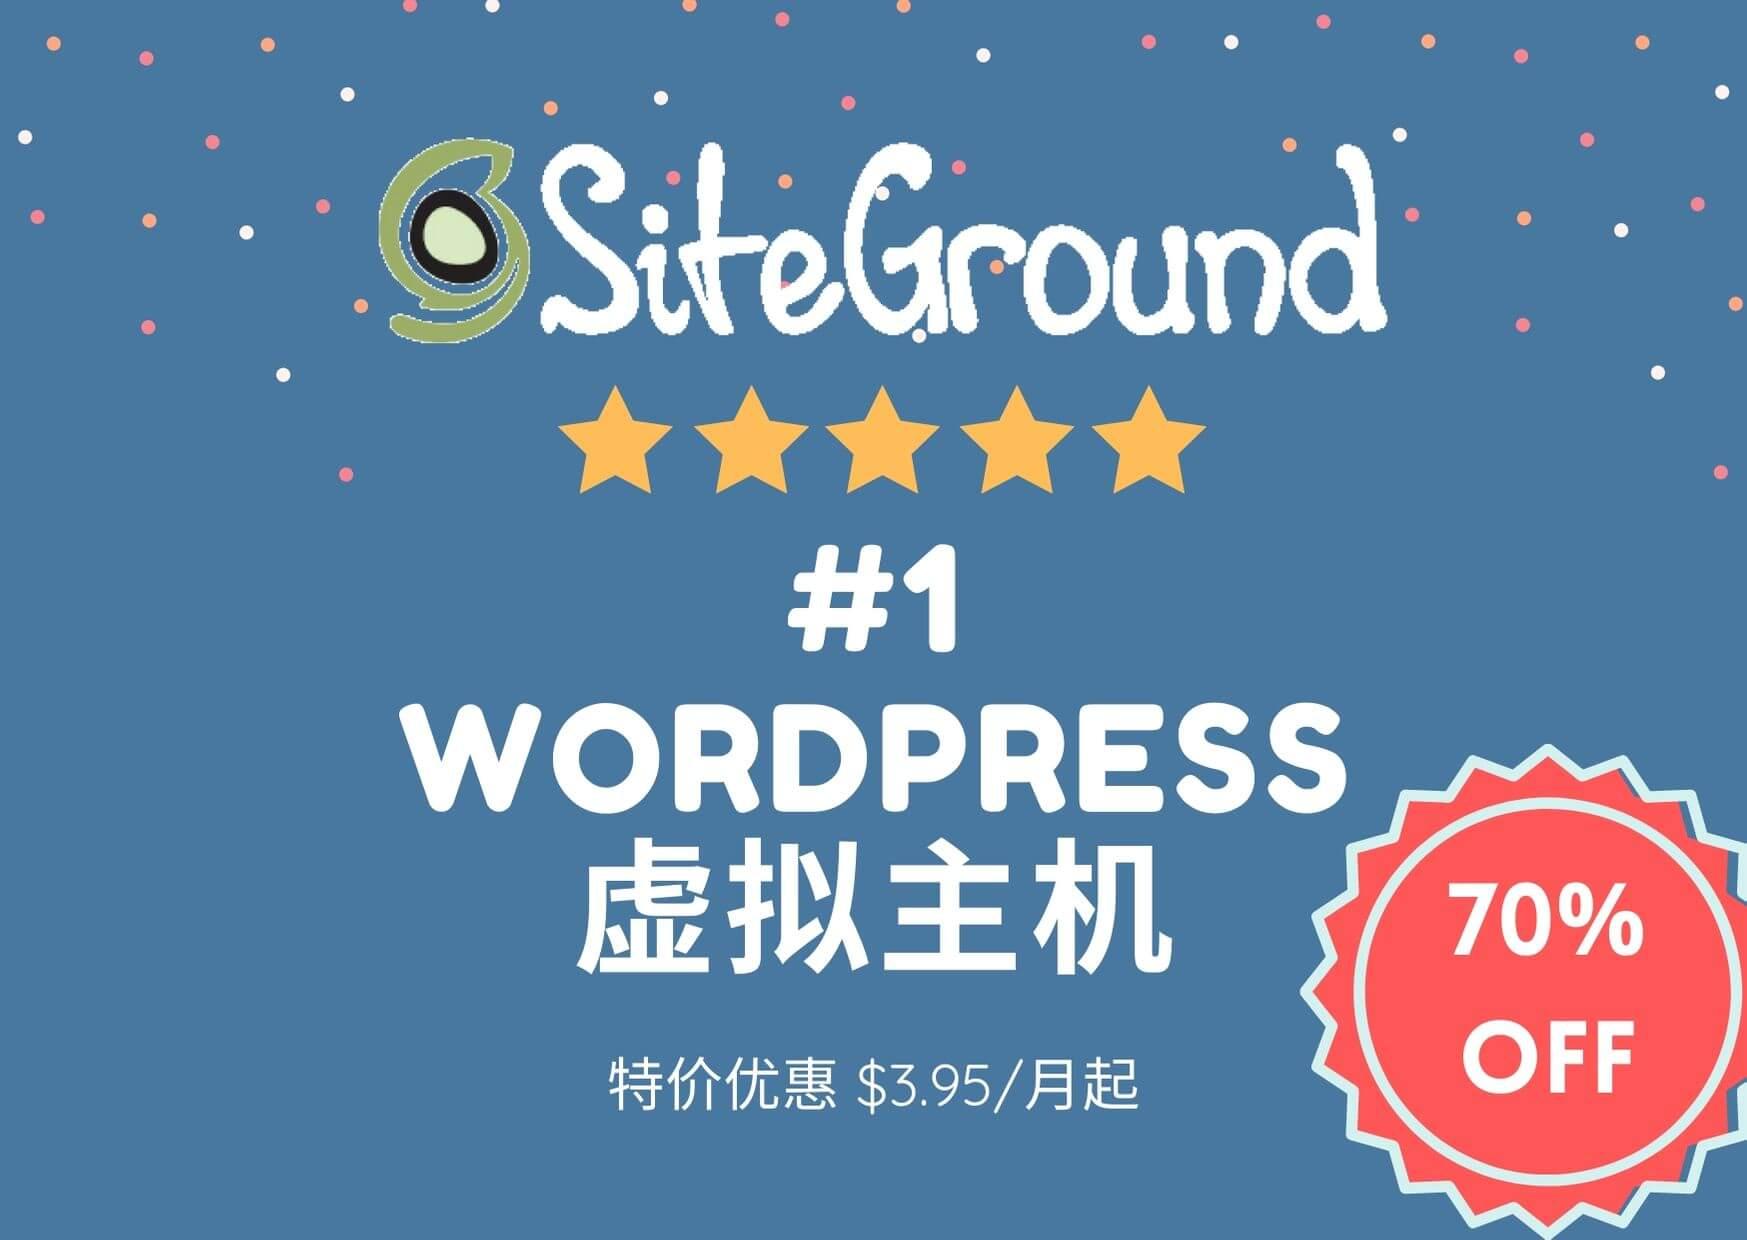 Siteground 主机 - #1 wordprss 虚拟主机推荐